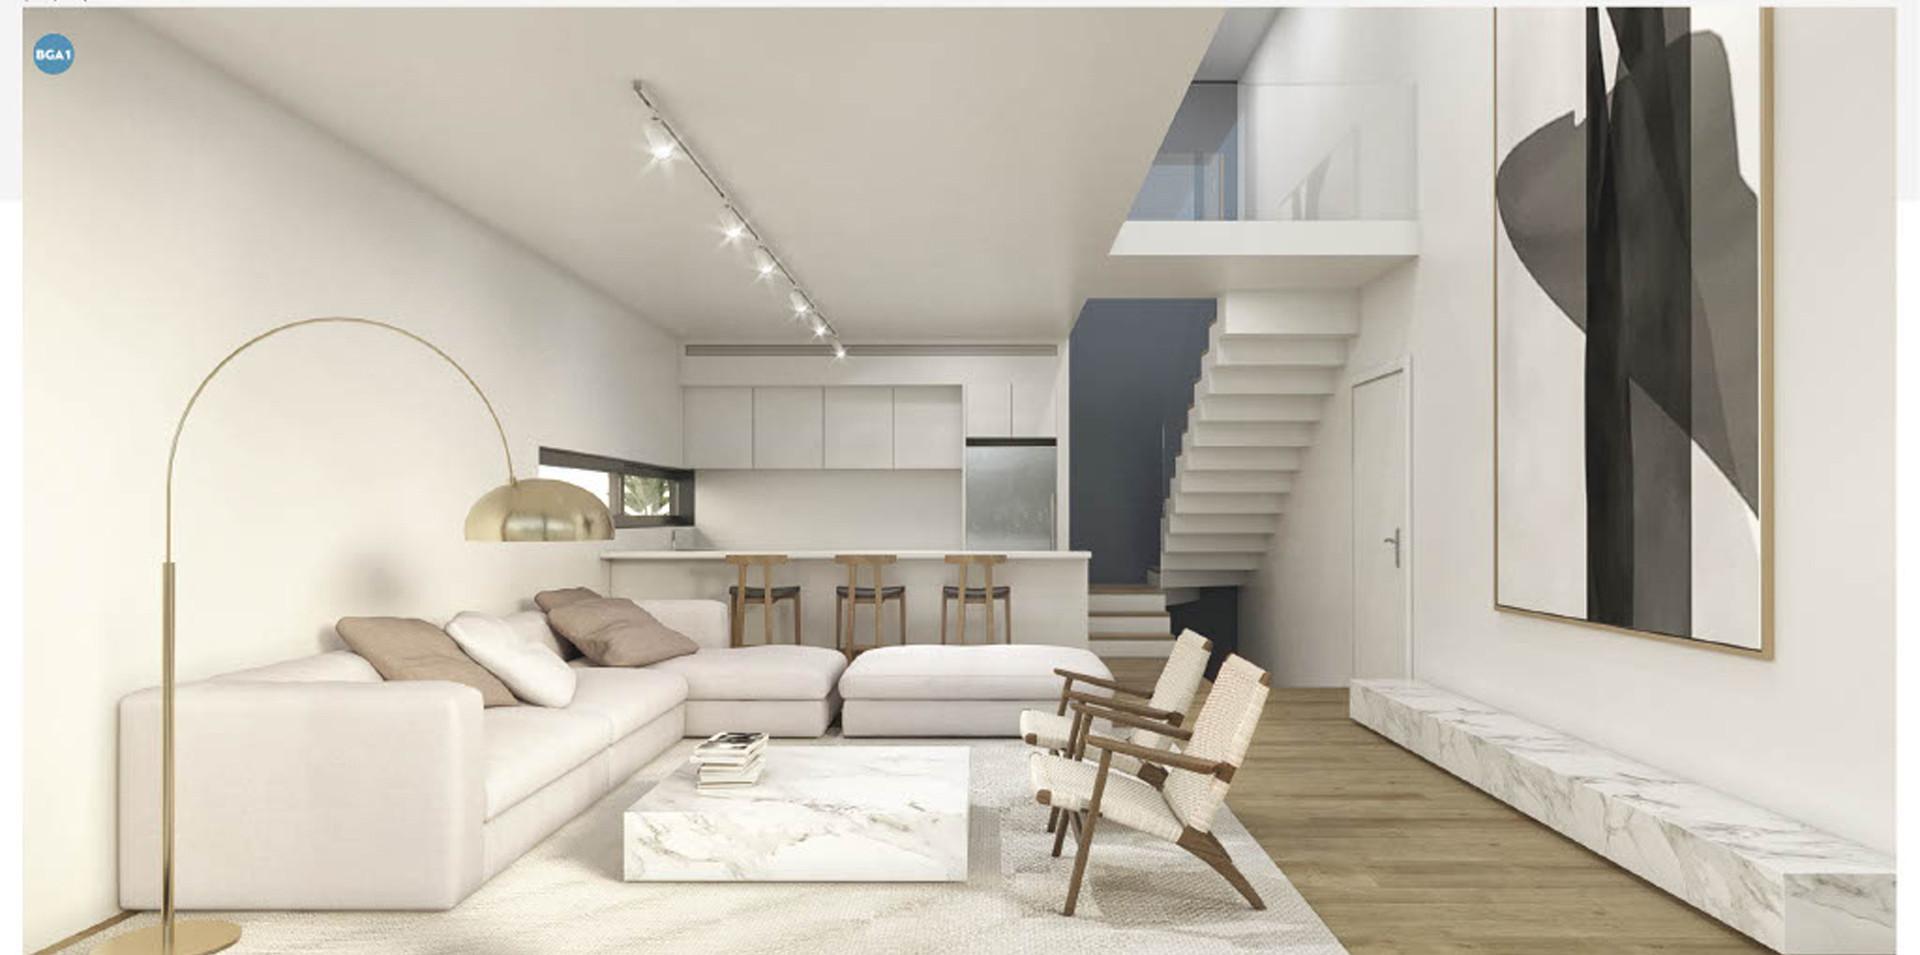 MIA Properties - Venizelou booklet(6)102